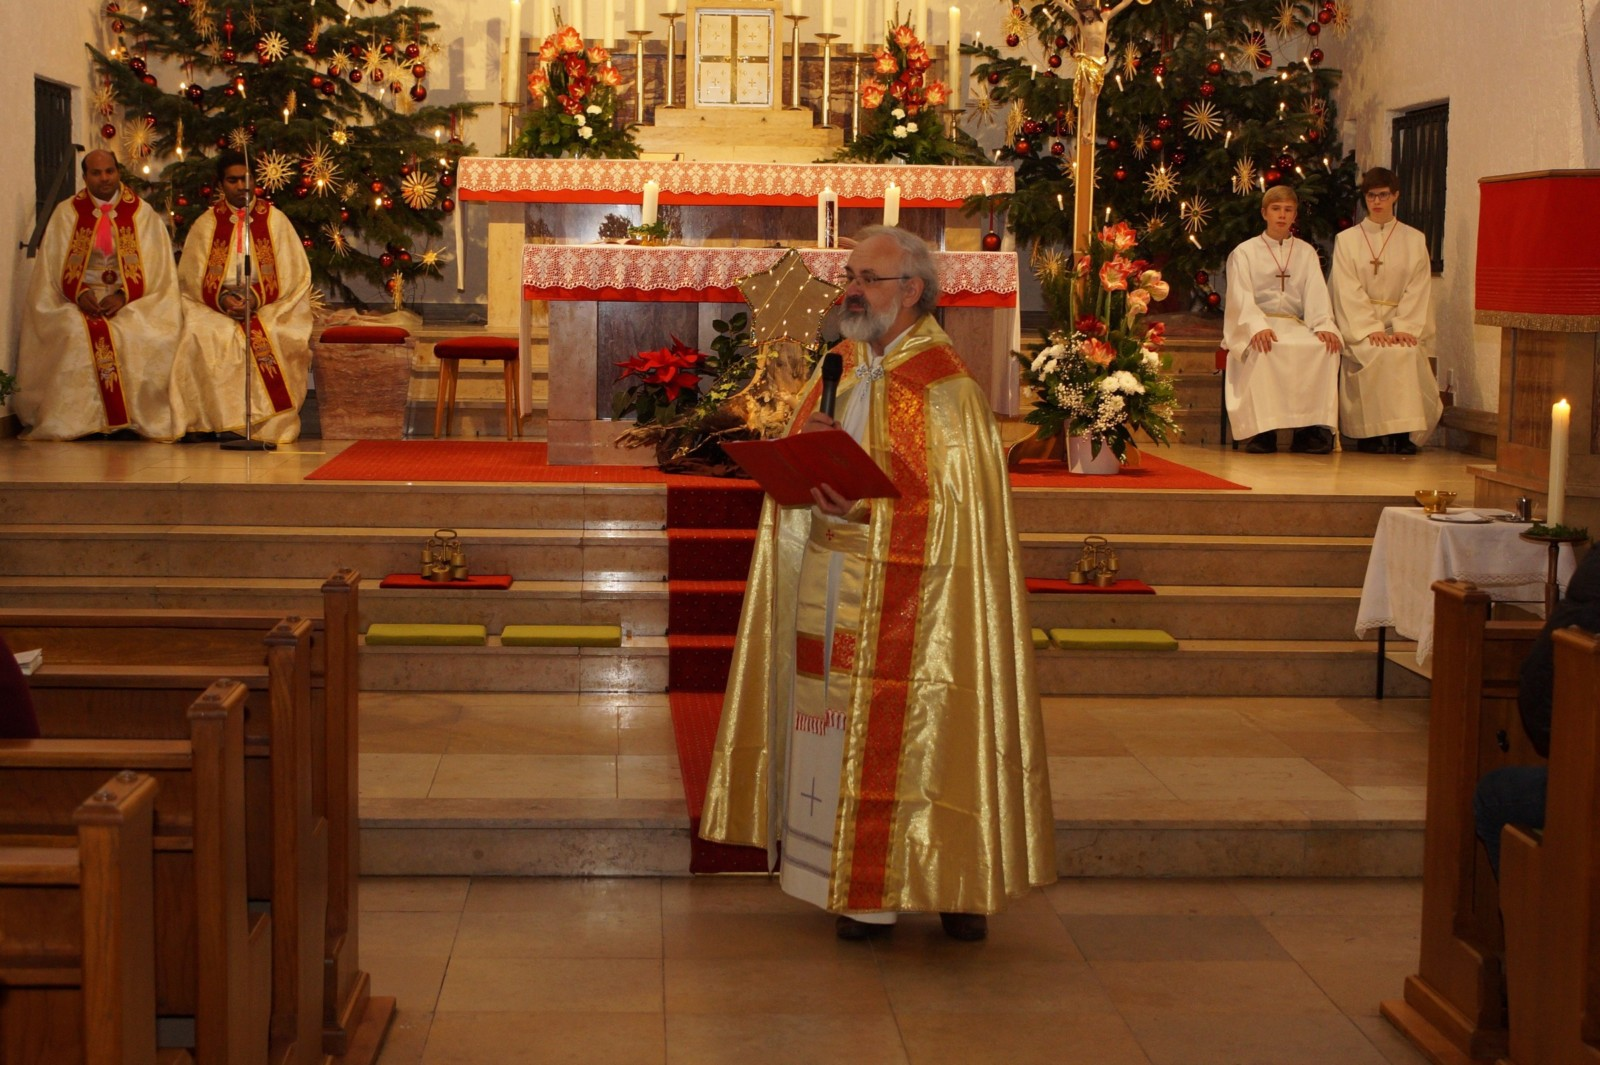 20181230-10 Jahre Priester Joseph DSC03755